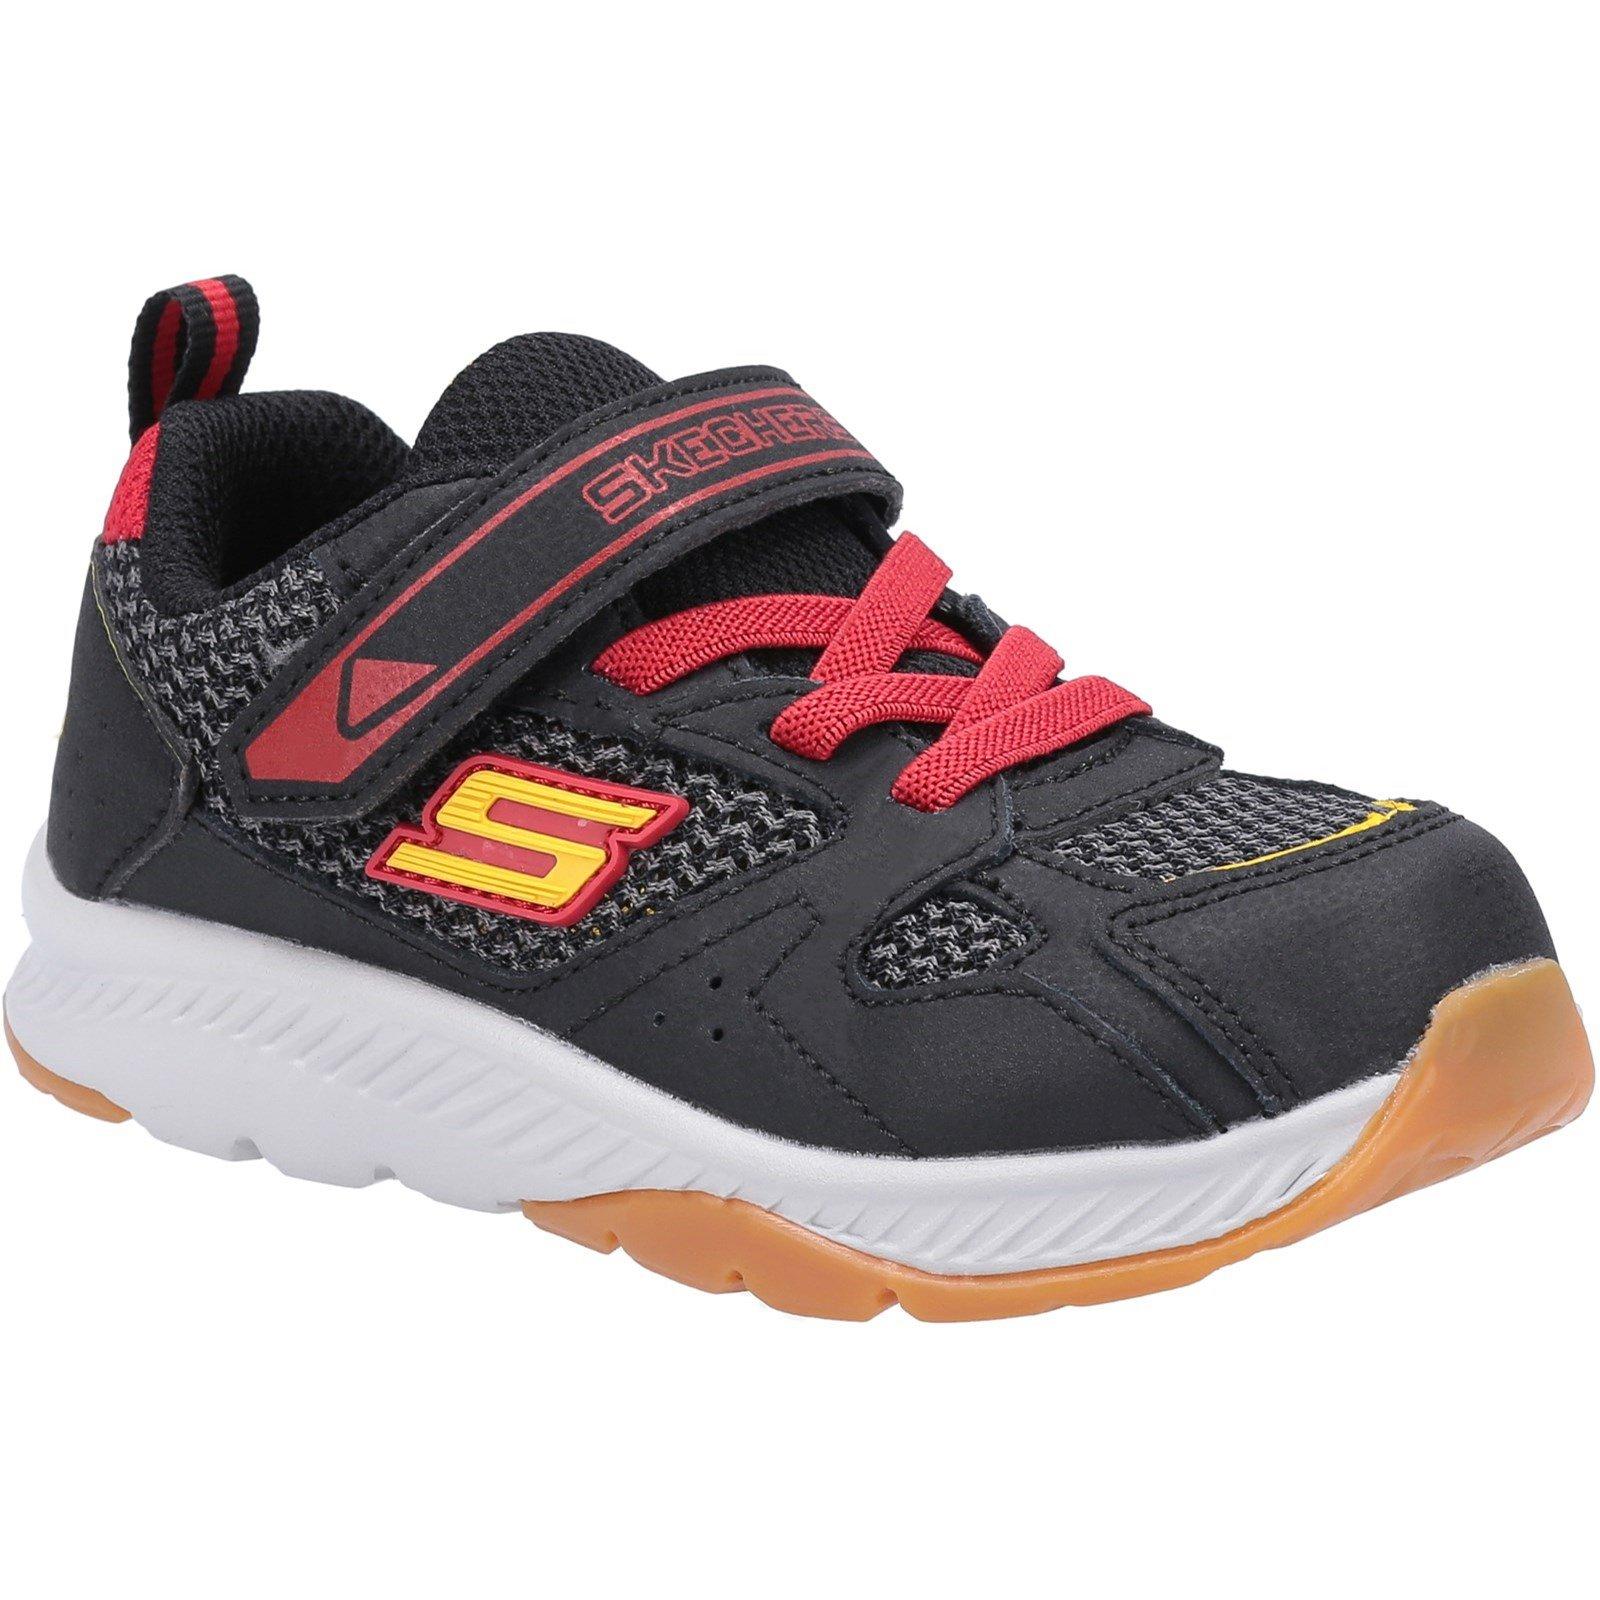 Skechers Kid's Comfy Grip Trainer Multicolor 30424 - Black/Red 5